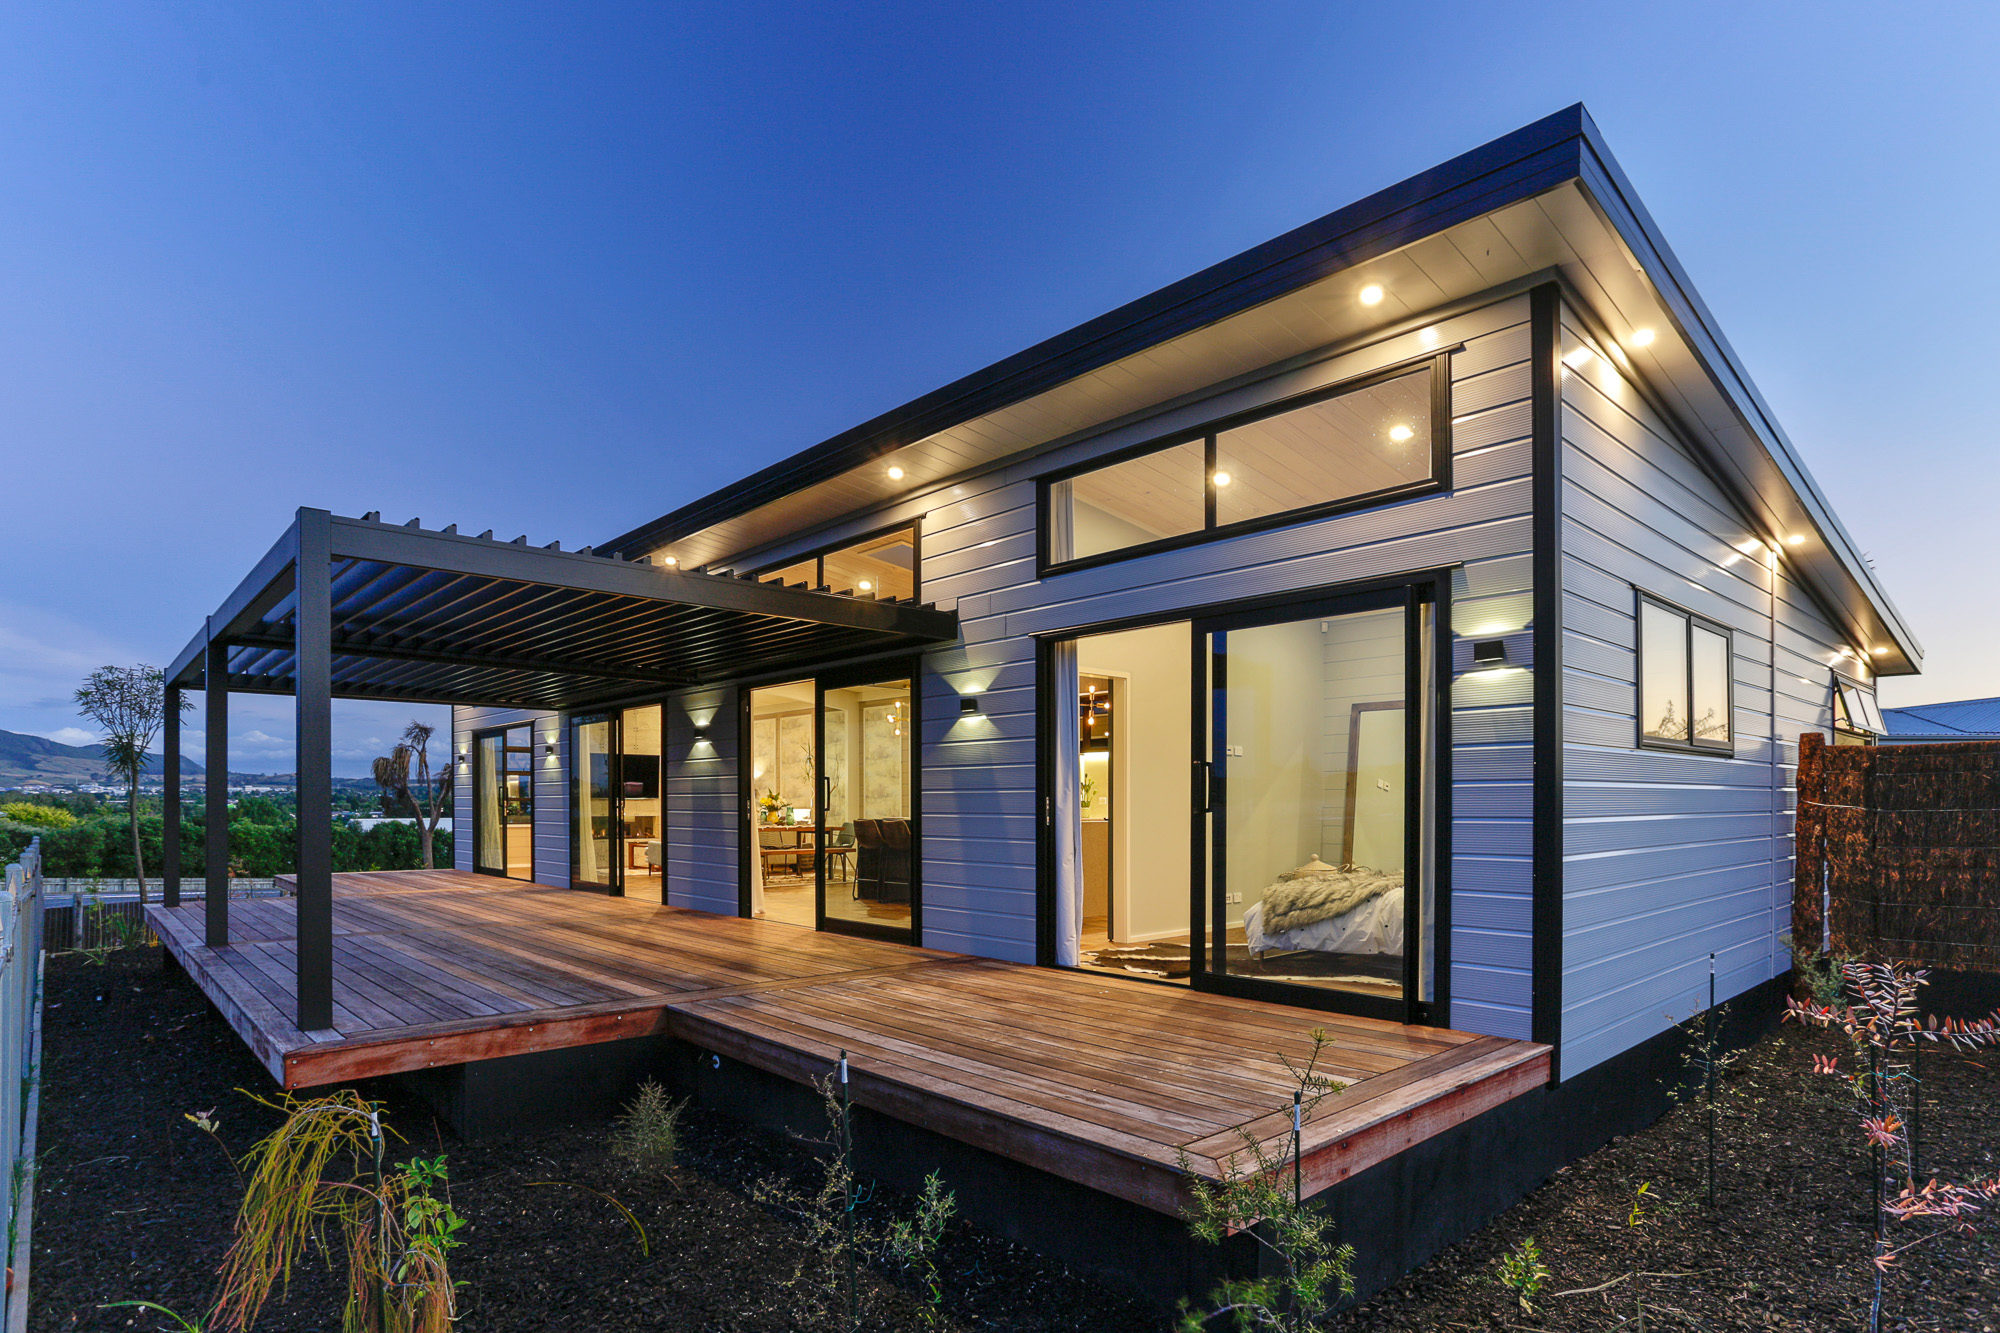 Lockwood Taupo Show Home with dark corner profiles